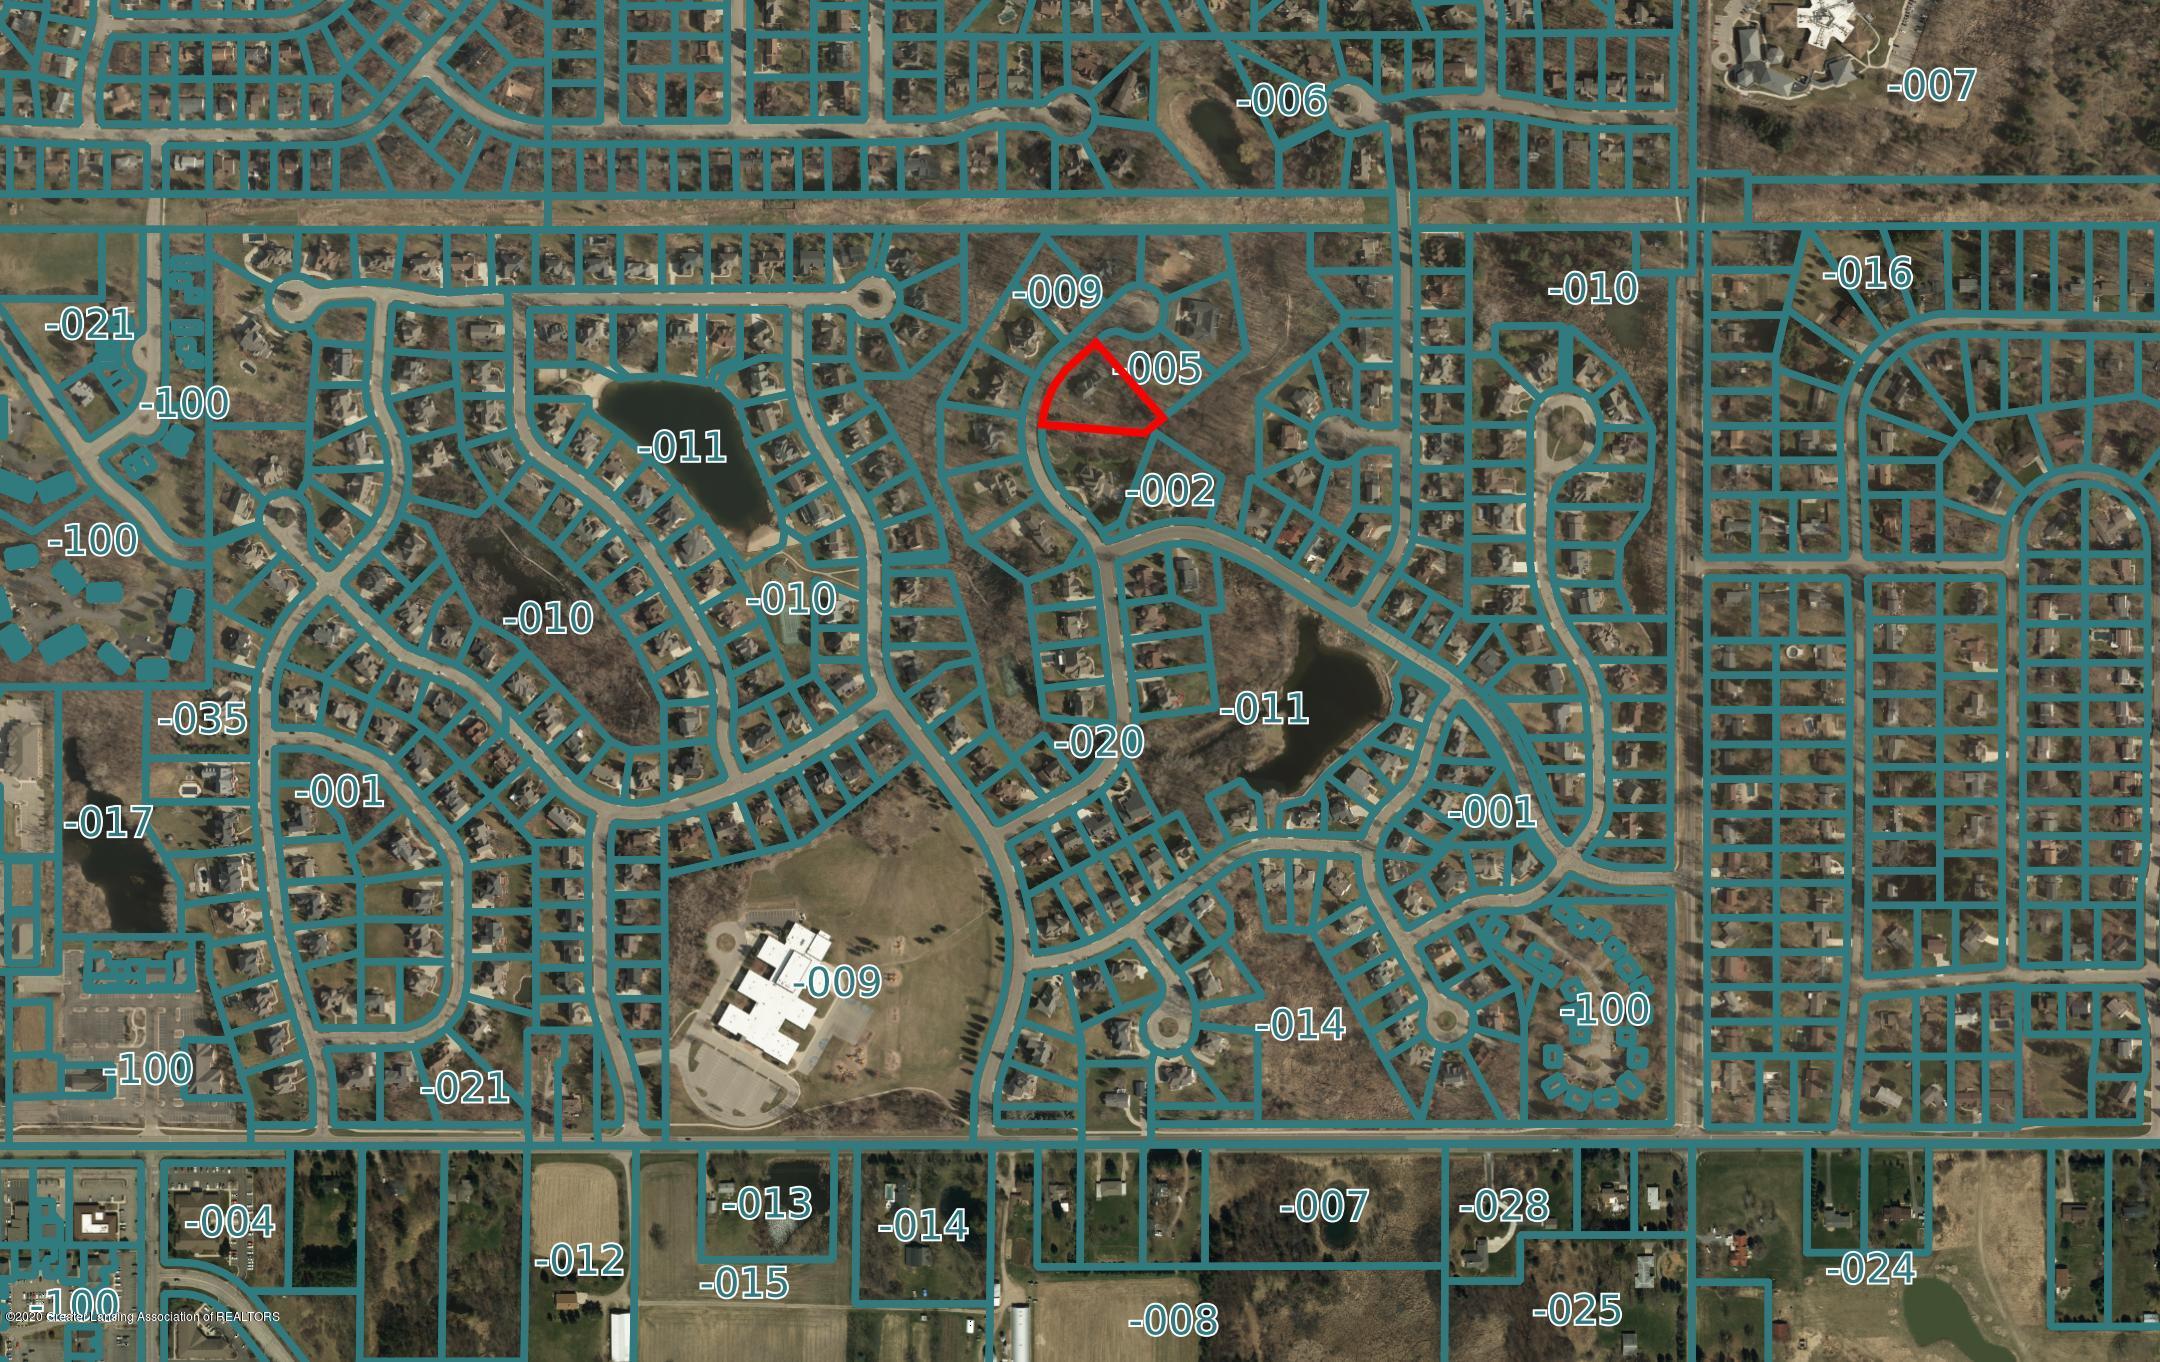 3700 Beech Tree Ln - 3700 Beech Tree GIS Aerial - 62